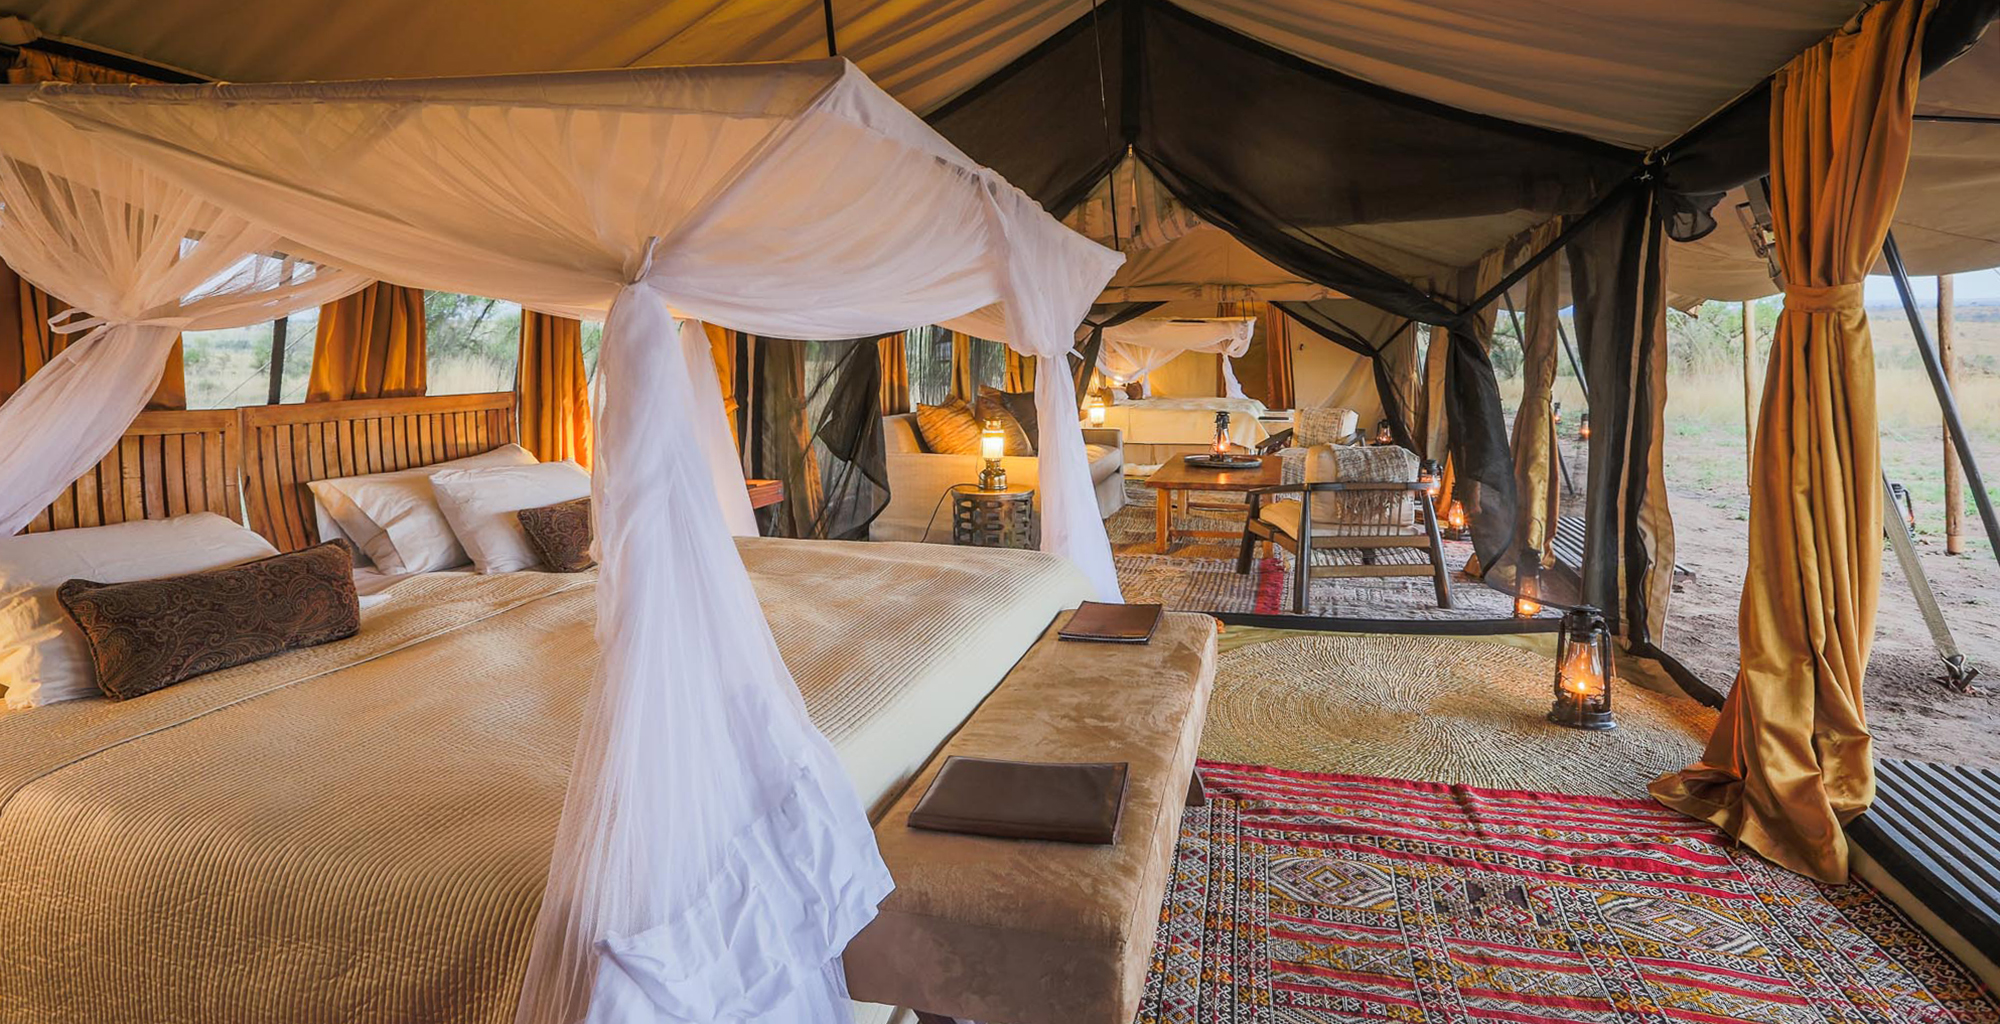 Tanzania-Legendary-Serengeti-Camp-Bedroom